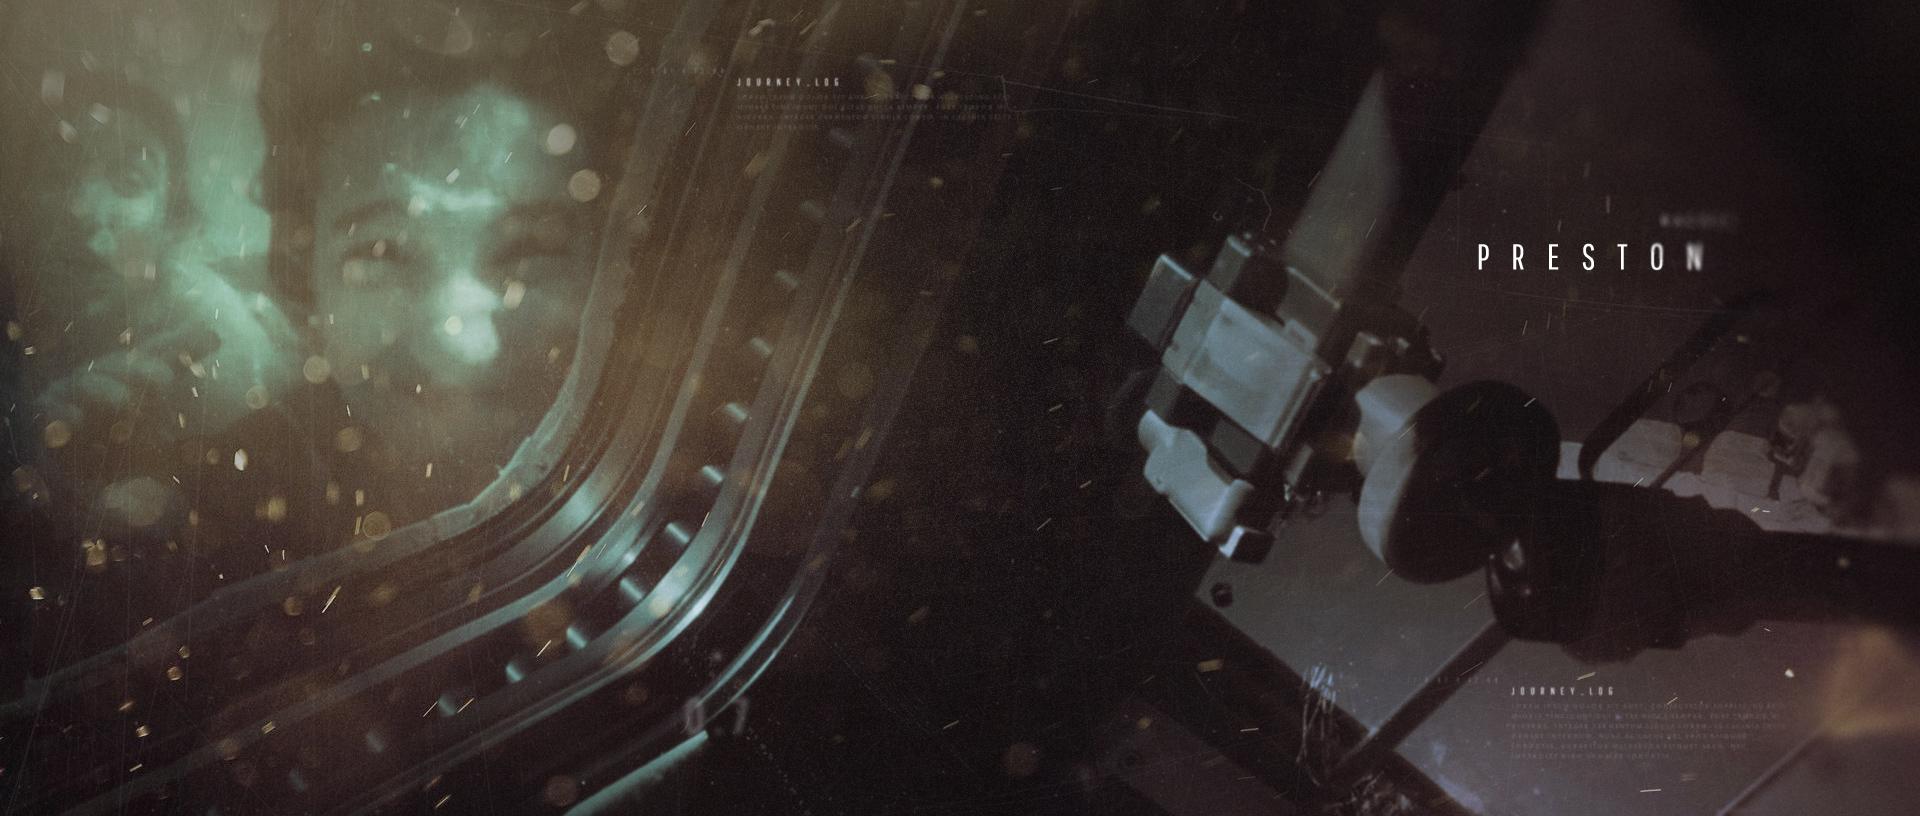 05-window-view.jpg